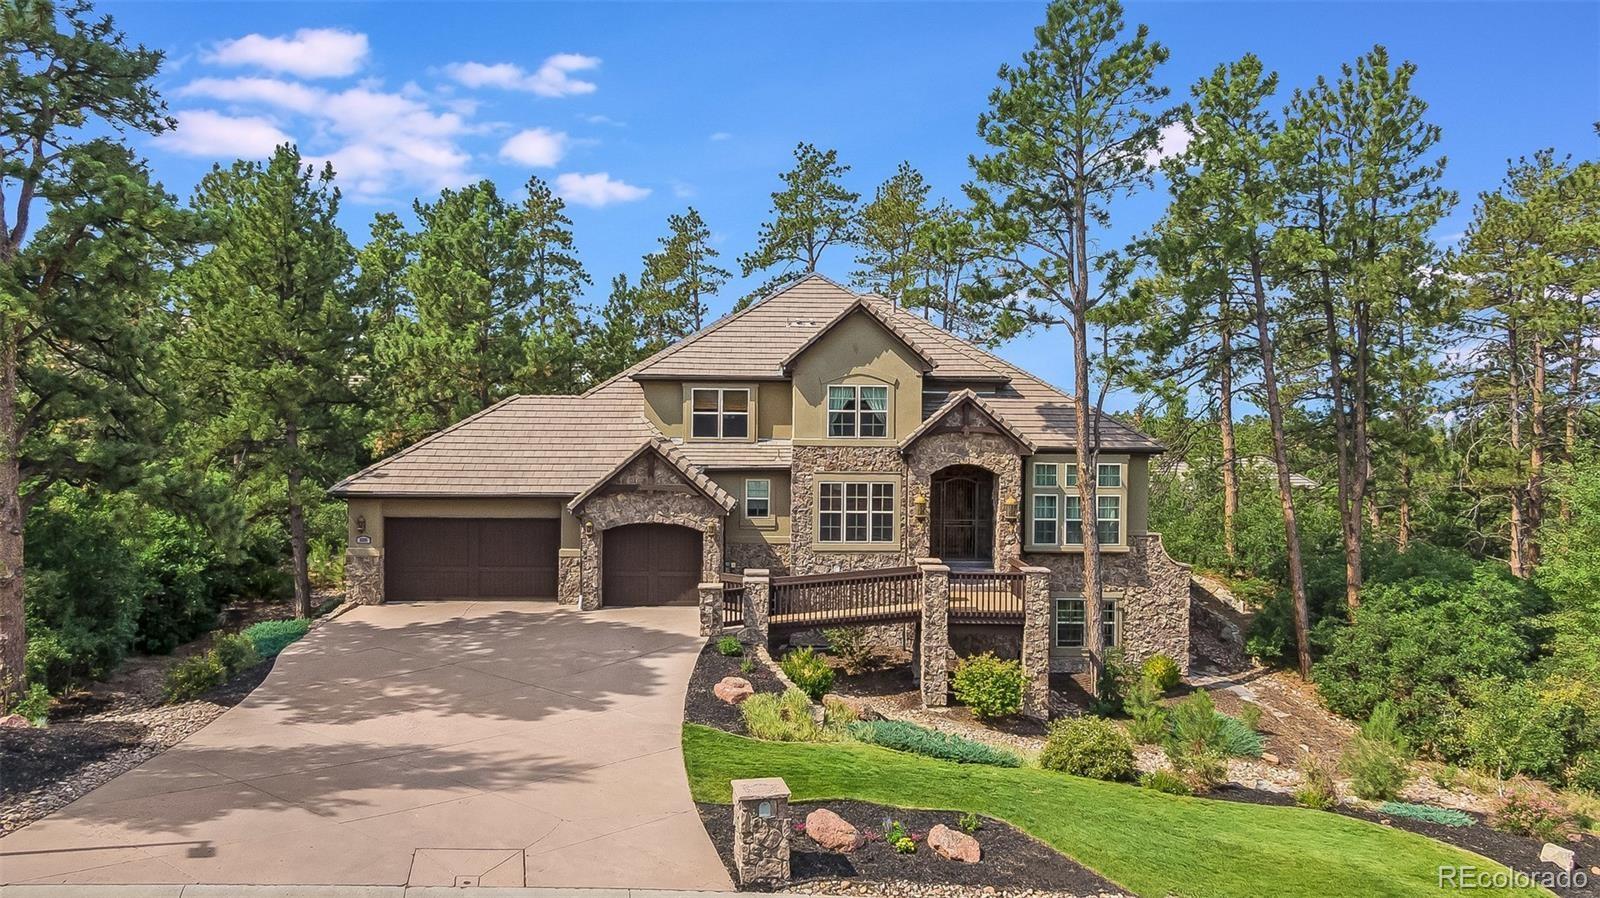 MLS# 6470698 - 4 - 5225 Knobcone Drive, Castle Rock, CO 80108